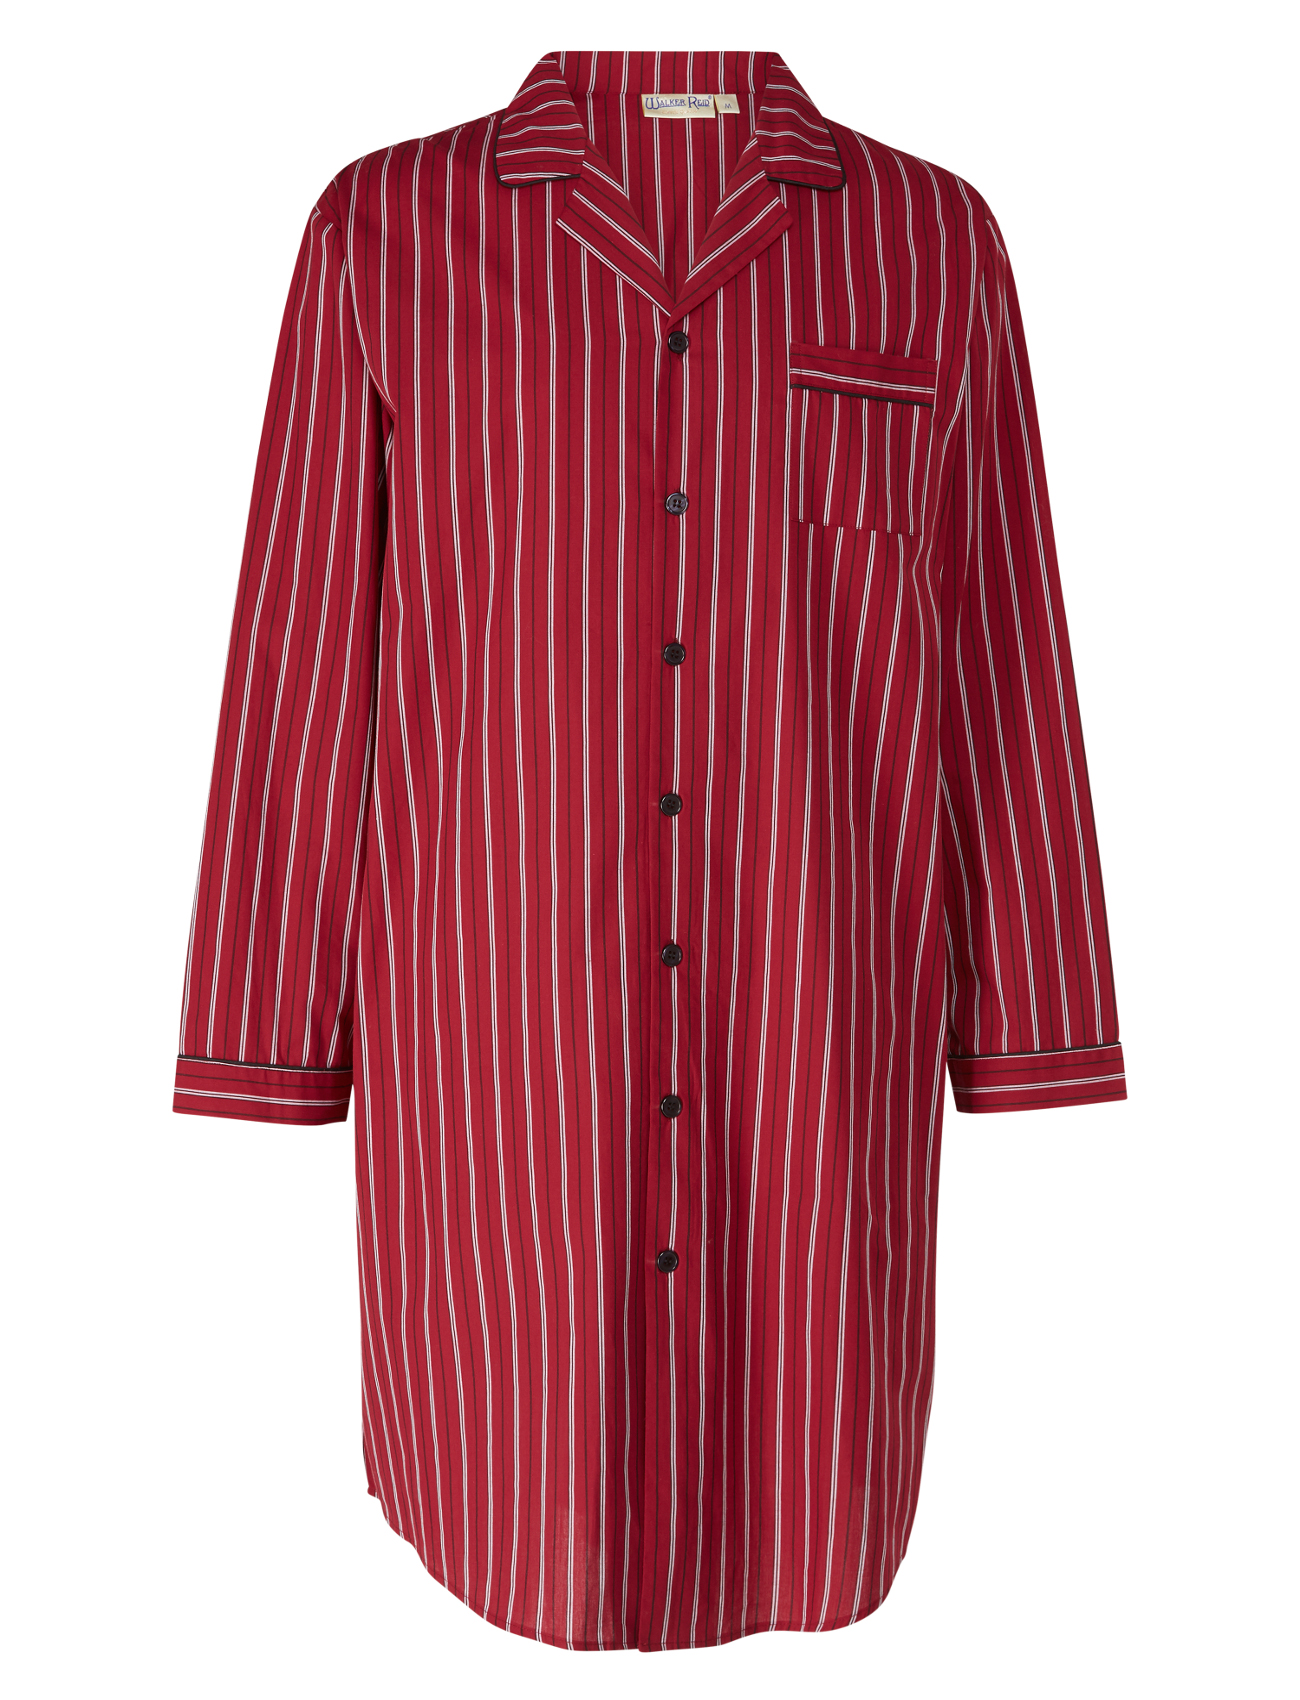 Night Shirt Woven Stripe Mens 100 Cotton Twill Walker